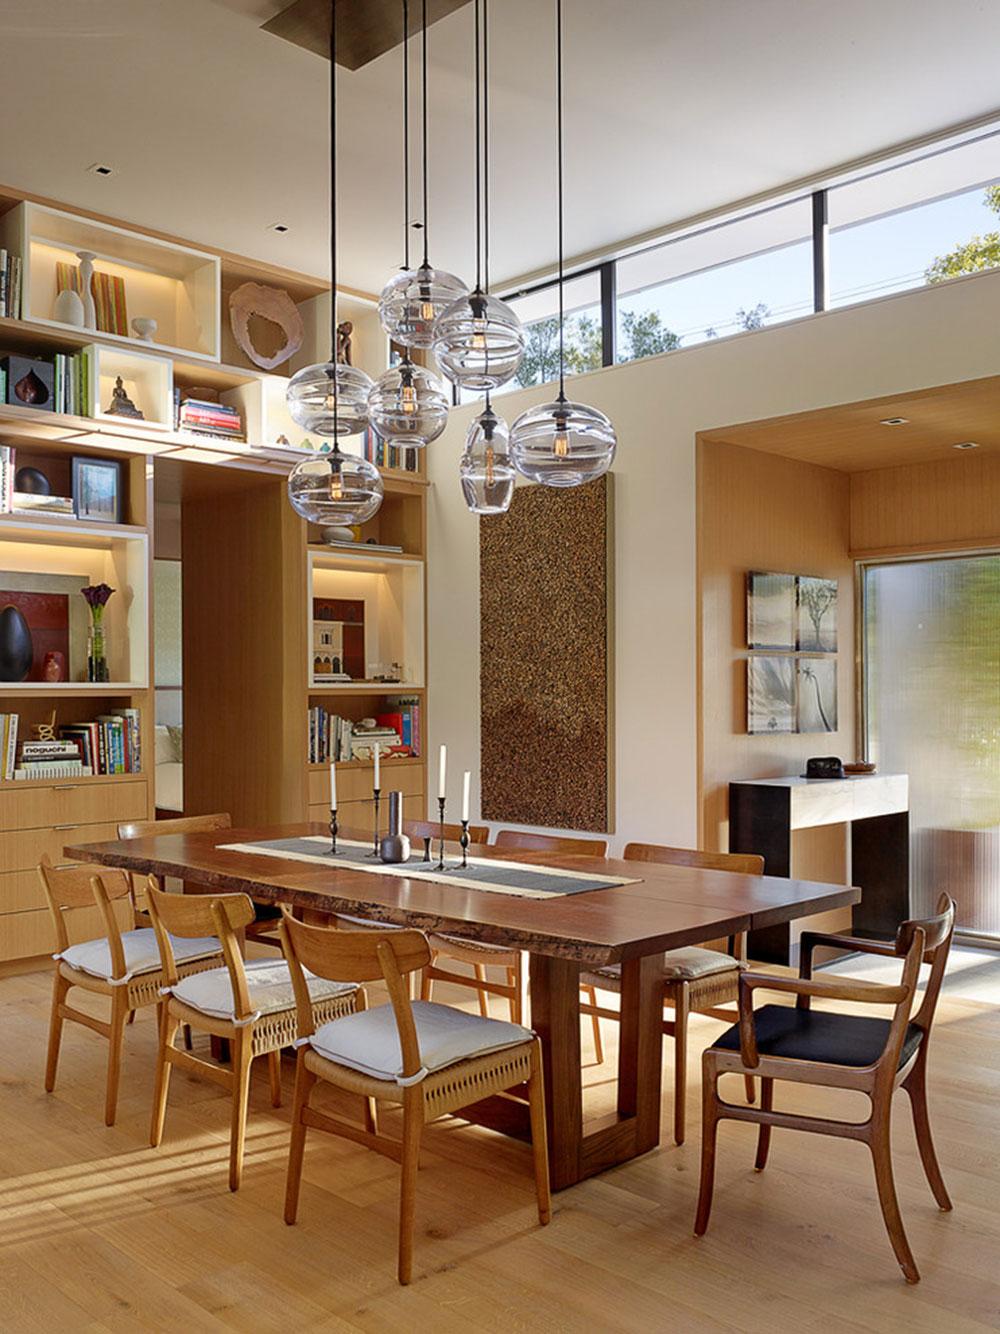 Best Kitchen Gallery: Interior Lighting Design For Homes of Light Designs For Homes on rachelxblog.com